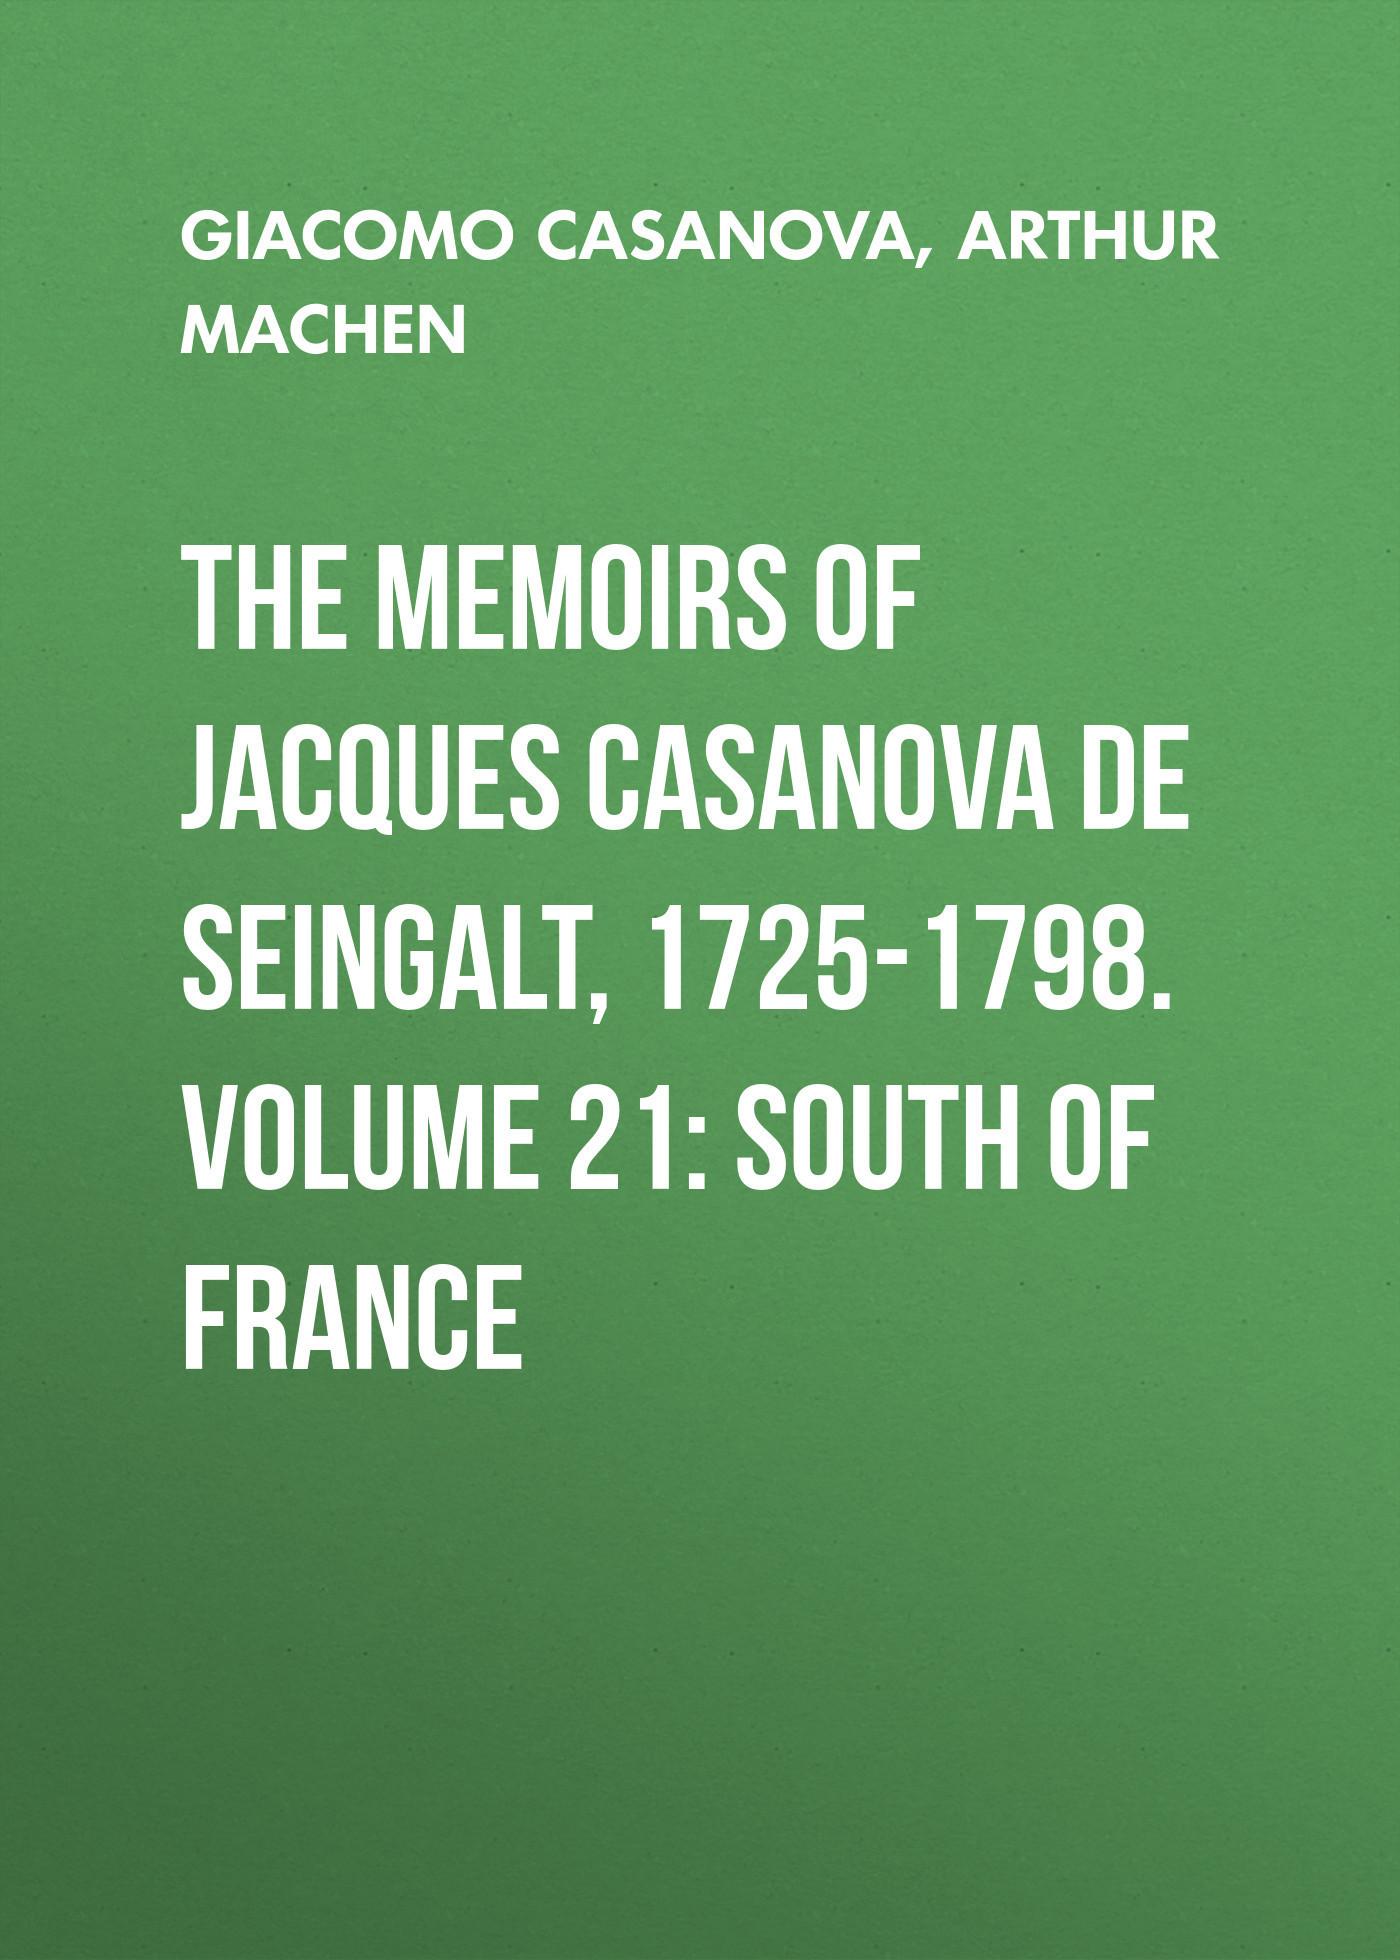 Arthur Machen The Memoirs of Jacques Casanova de Seingalt, 1725-1798. Volume 21: South of France anthony hamilton the memoirs of count grammont – volume 05